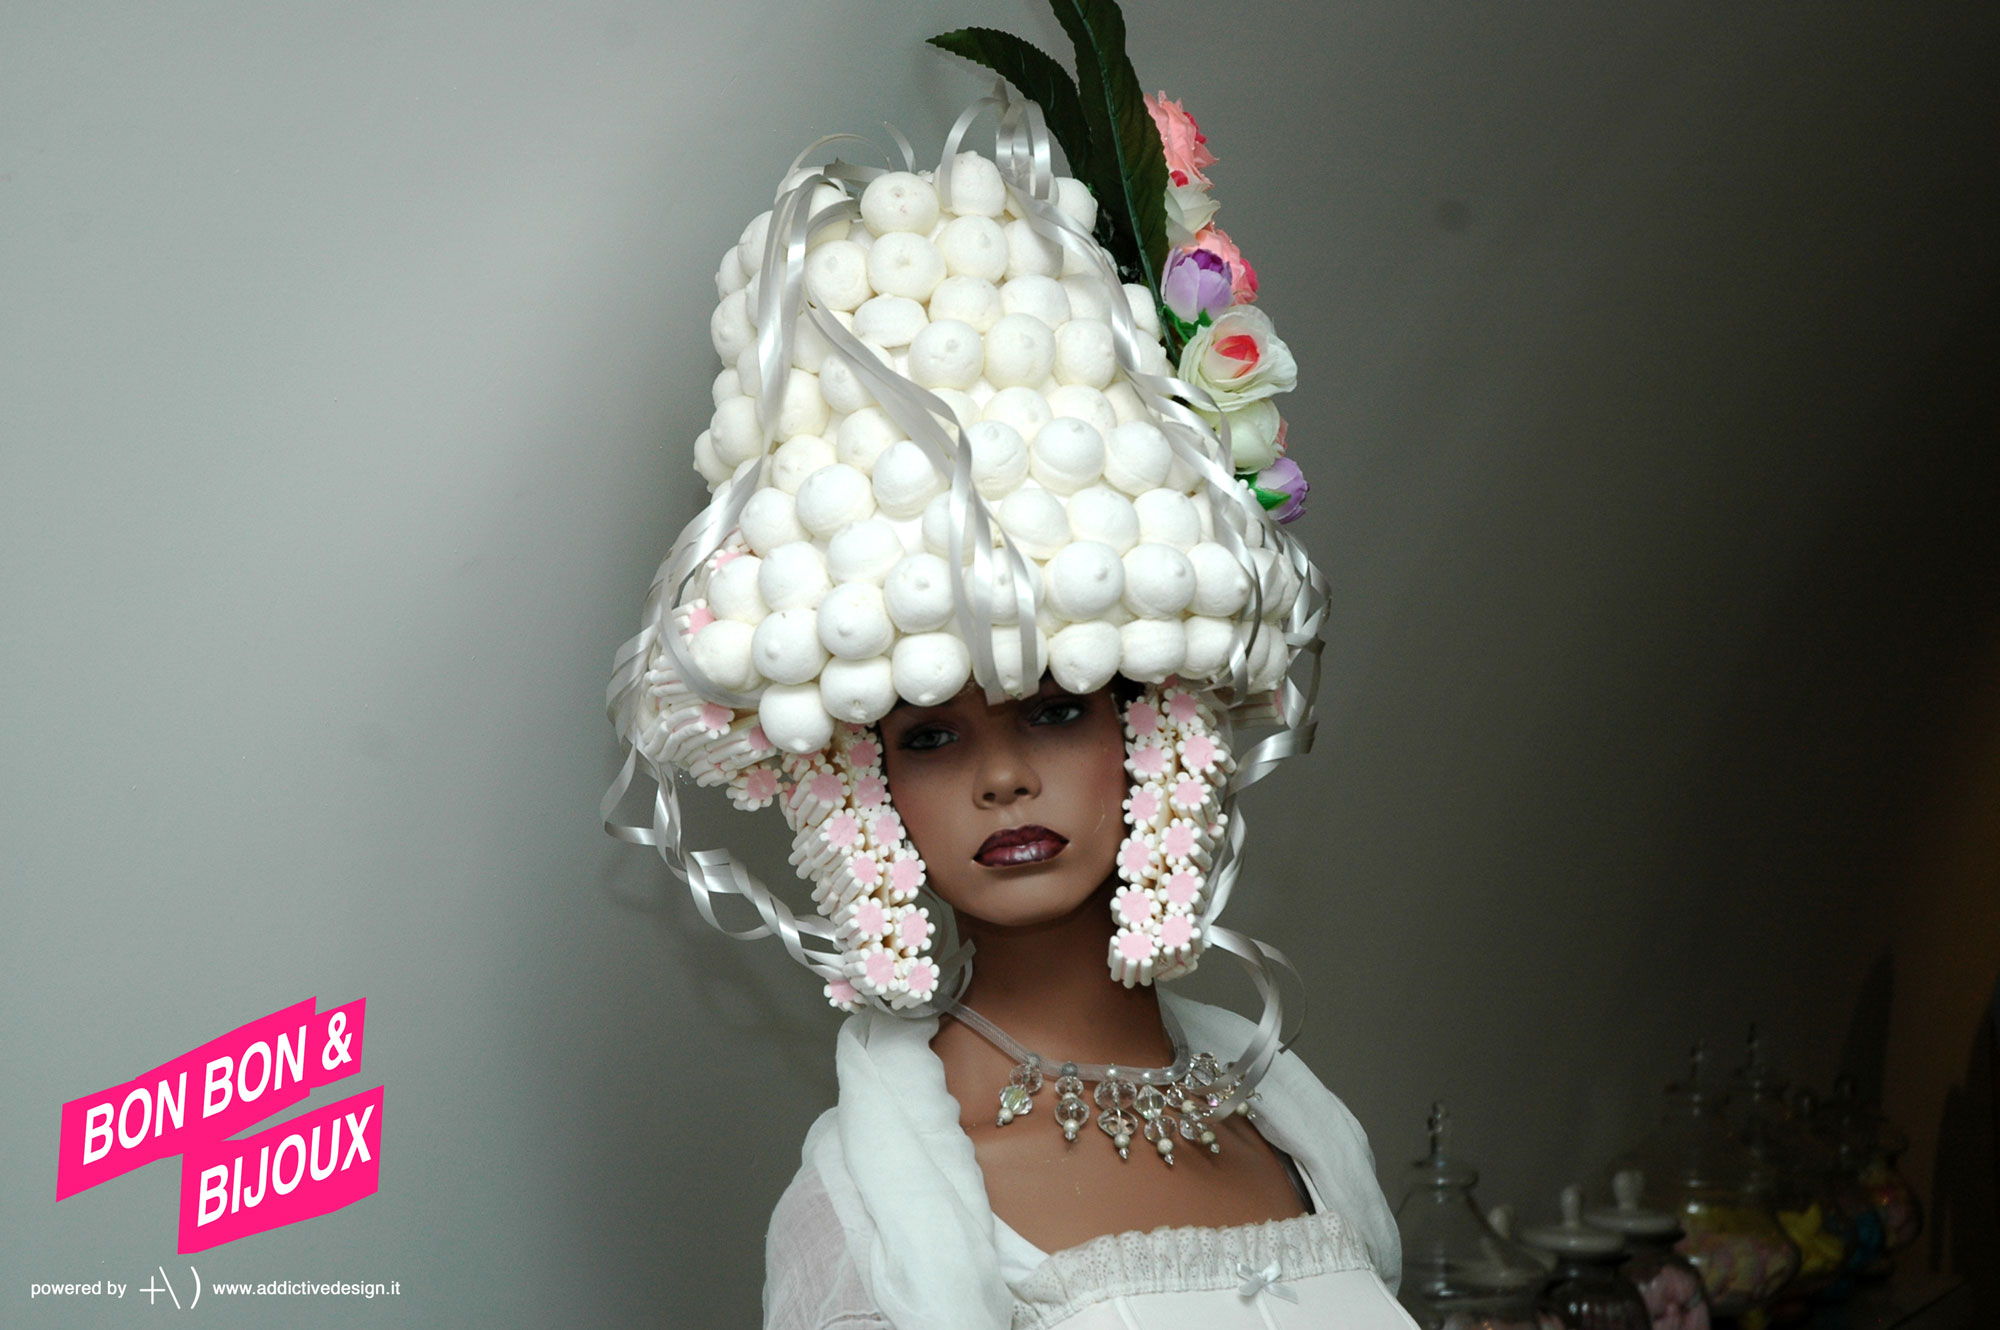 bonbon & bijoux parrucca di marshmallows